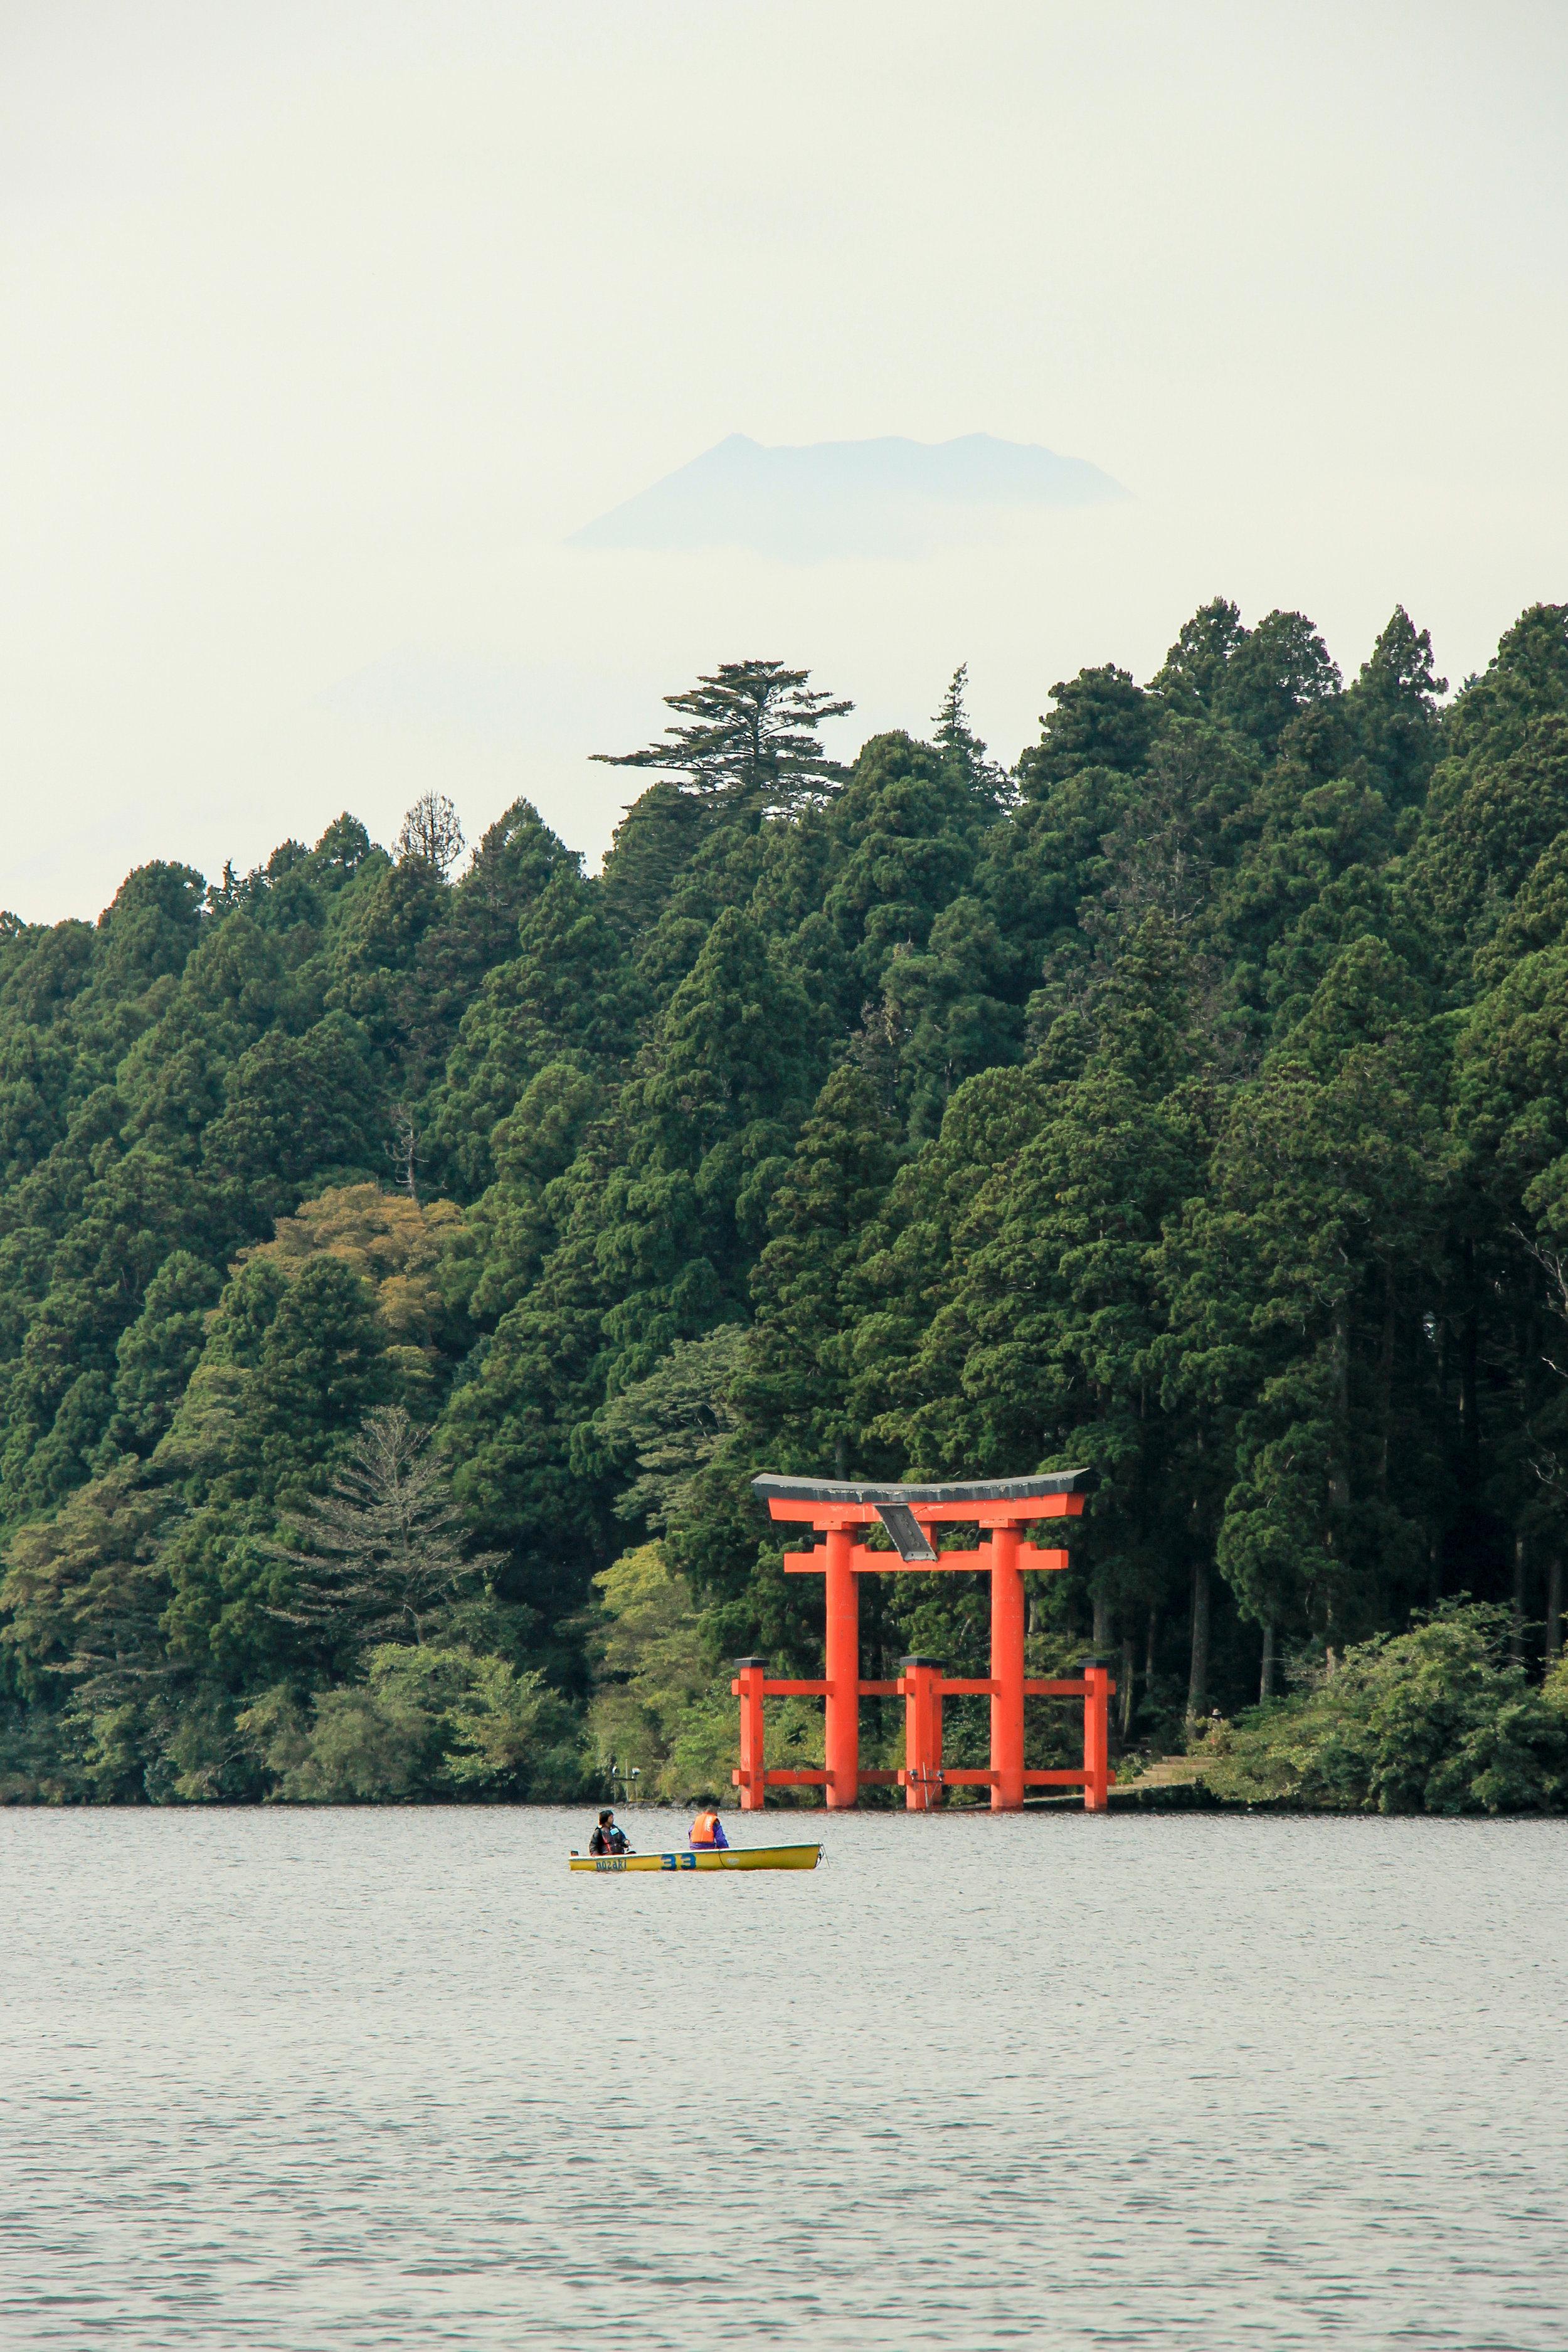 Hakone In A Simple Way Like That | Lake Ashi, Mount Fuji, Torii, Hakone | Fuji-Hakone-Izu National Park, Japan, Asia | DoLessGetMoreDone.com |